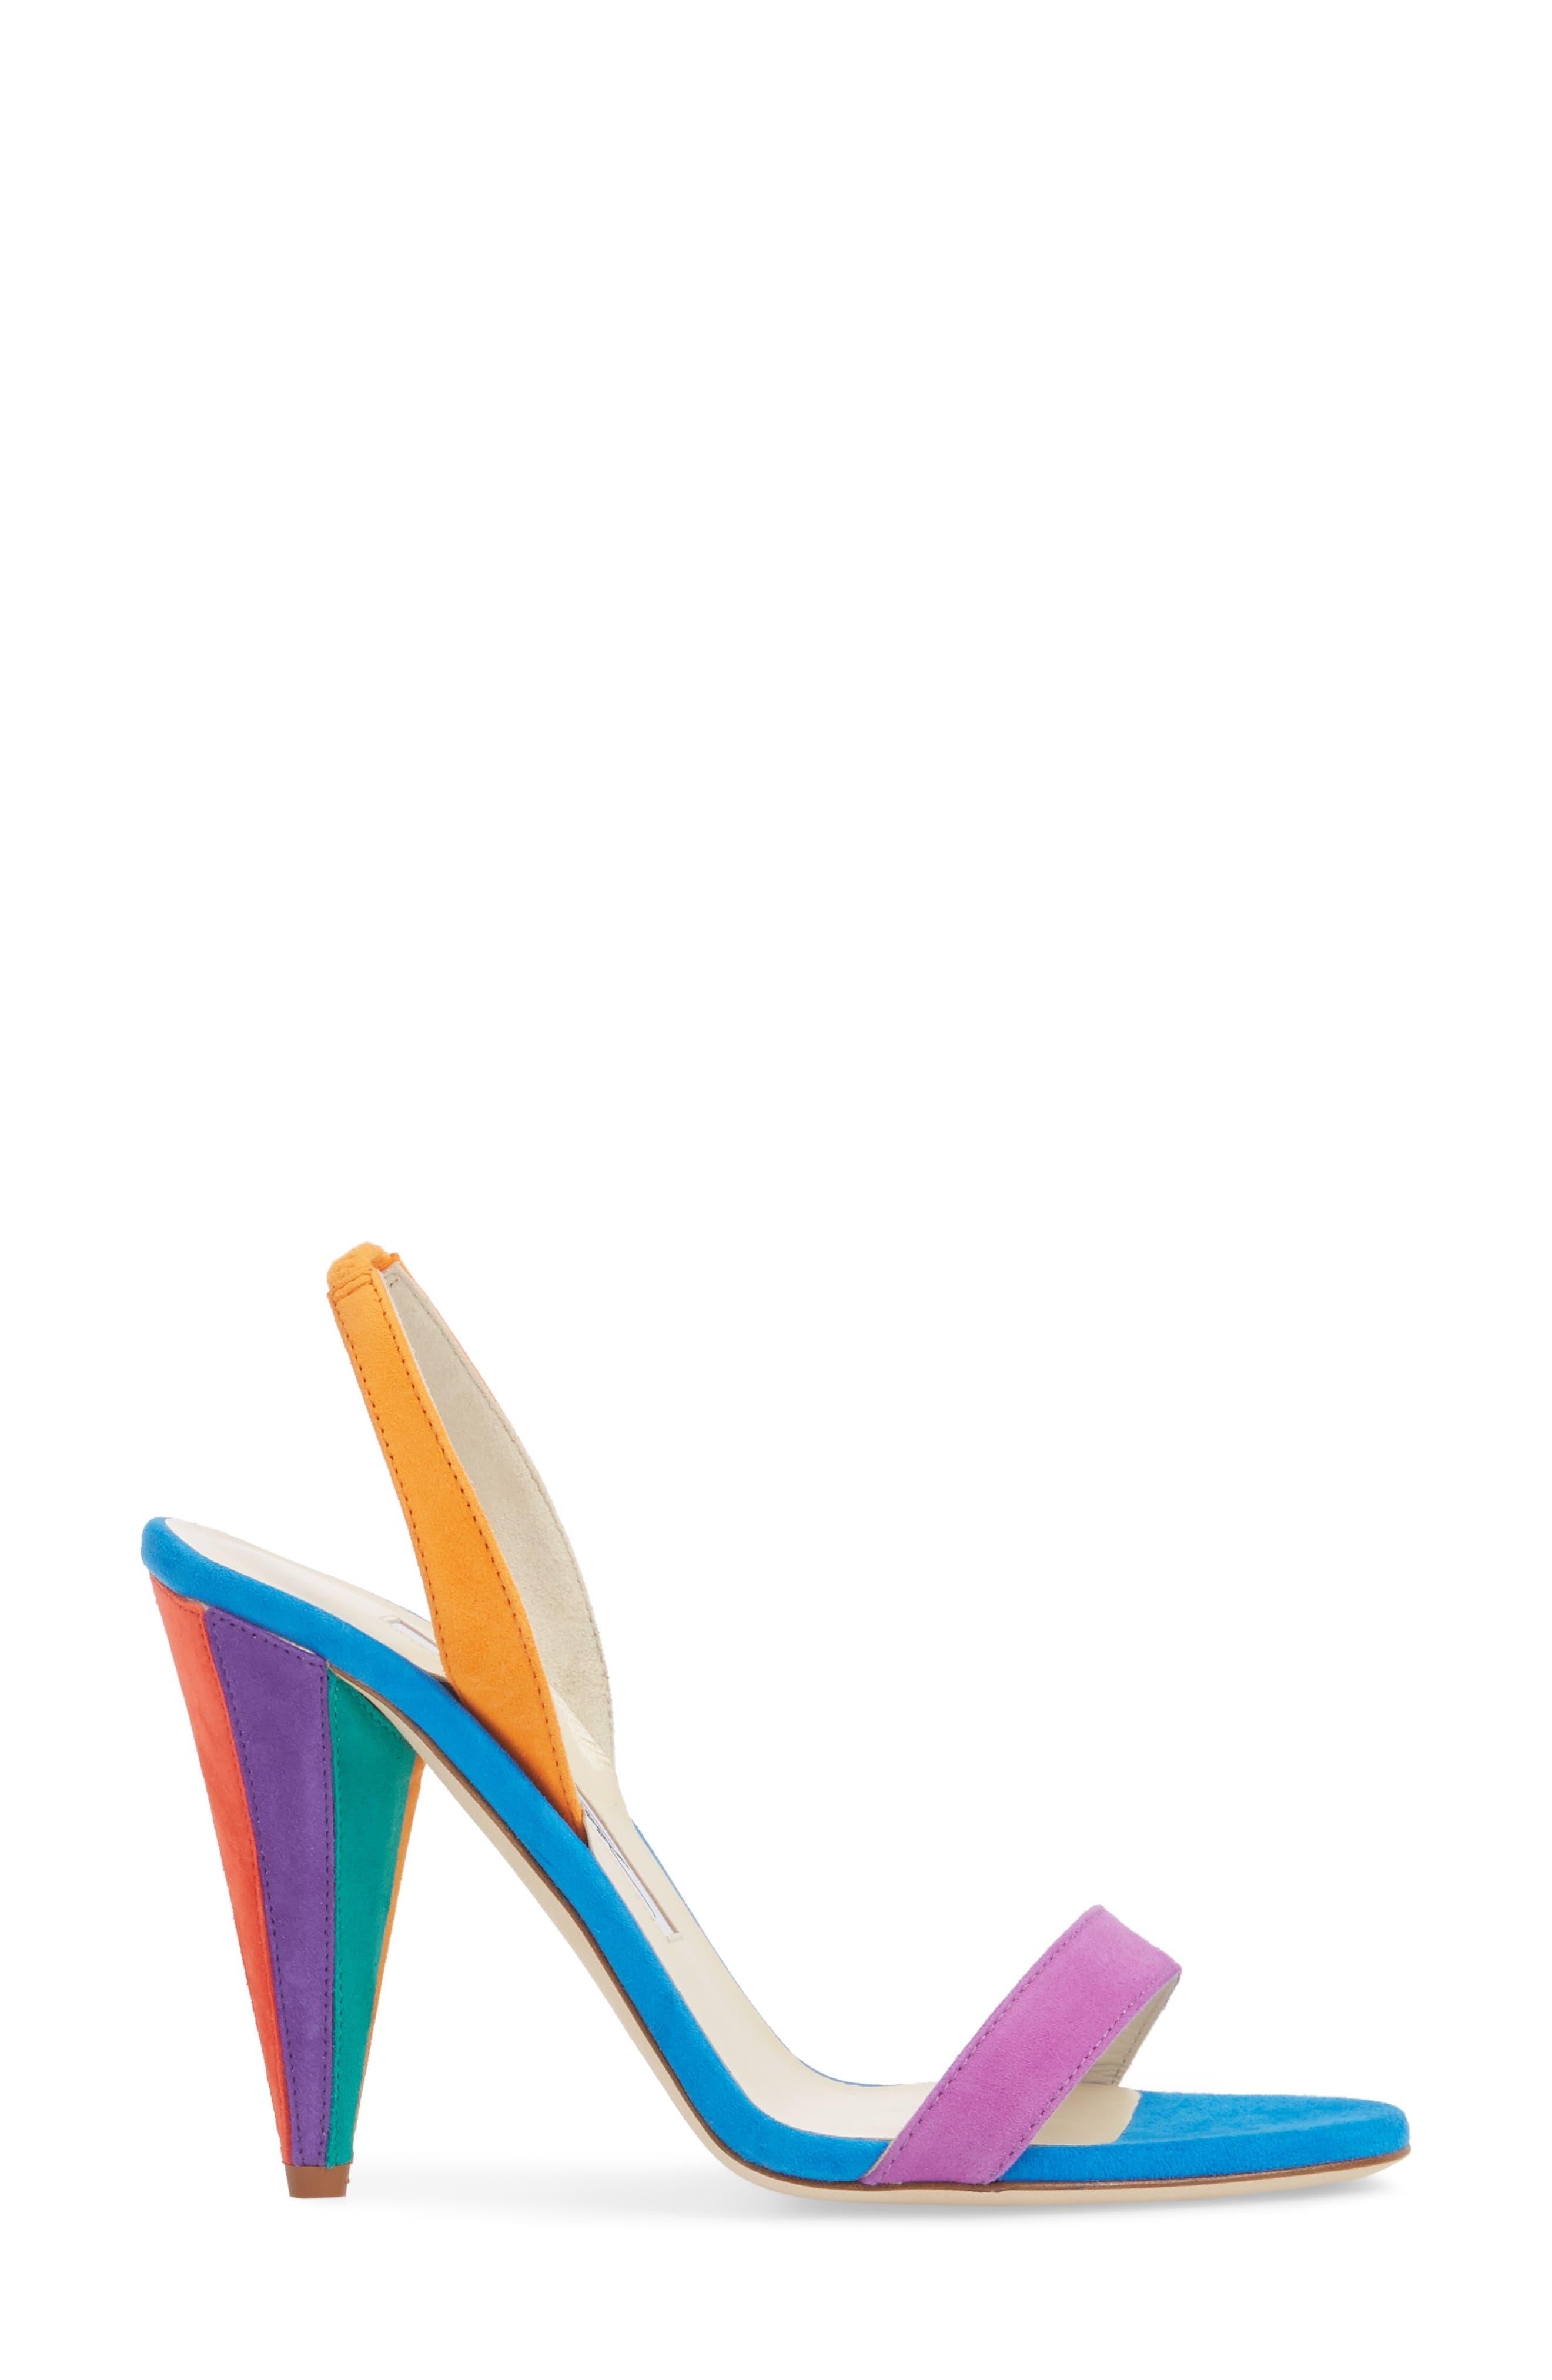 Susii Cone Heel Sandal,                             Alternate thumbnail 3, color,                             400